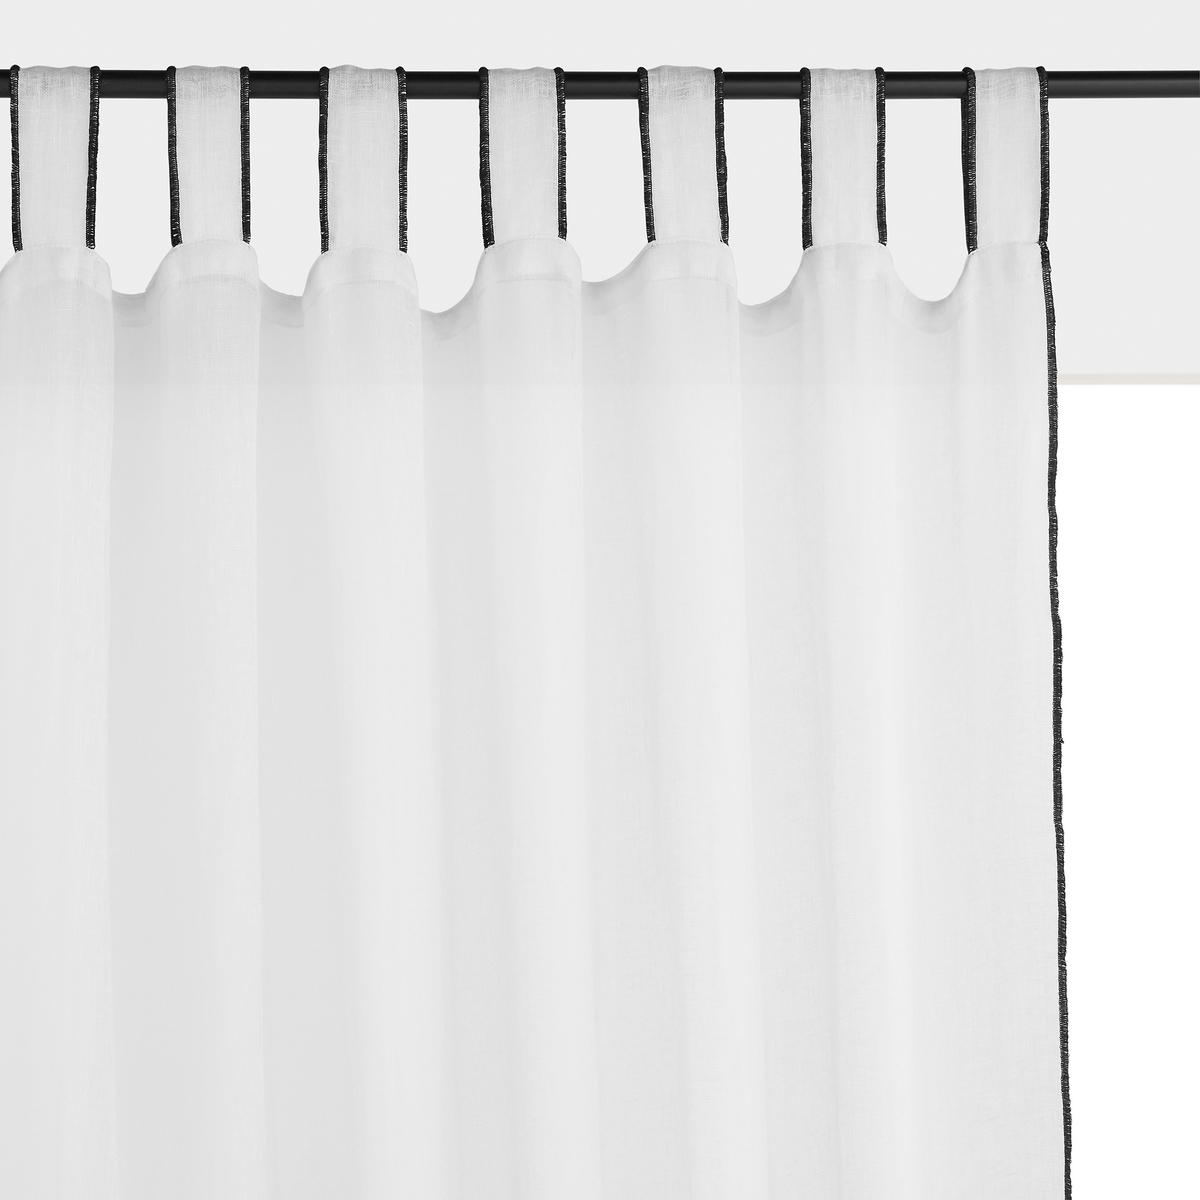 Занавеска La Redoute лен Tazina 140 x 350 см белый цена 2017